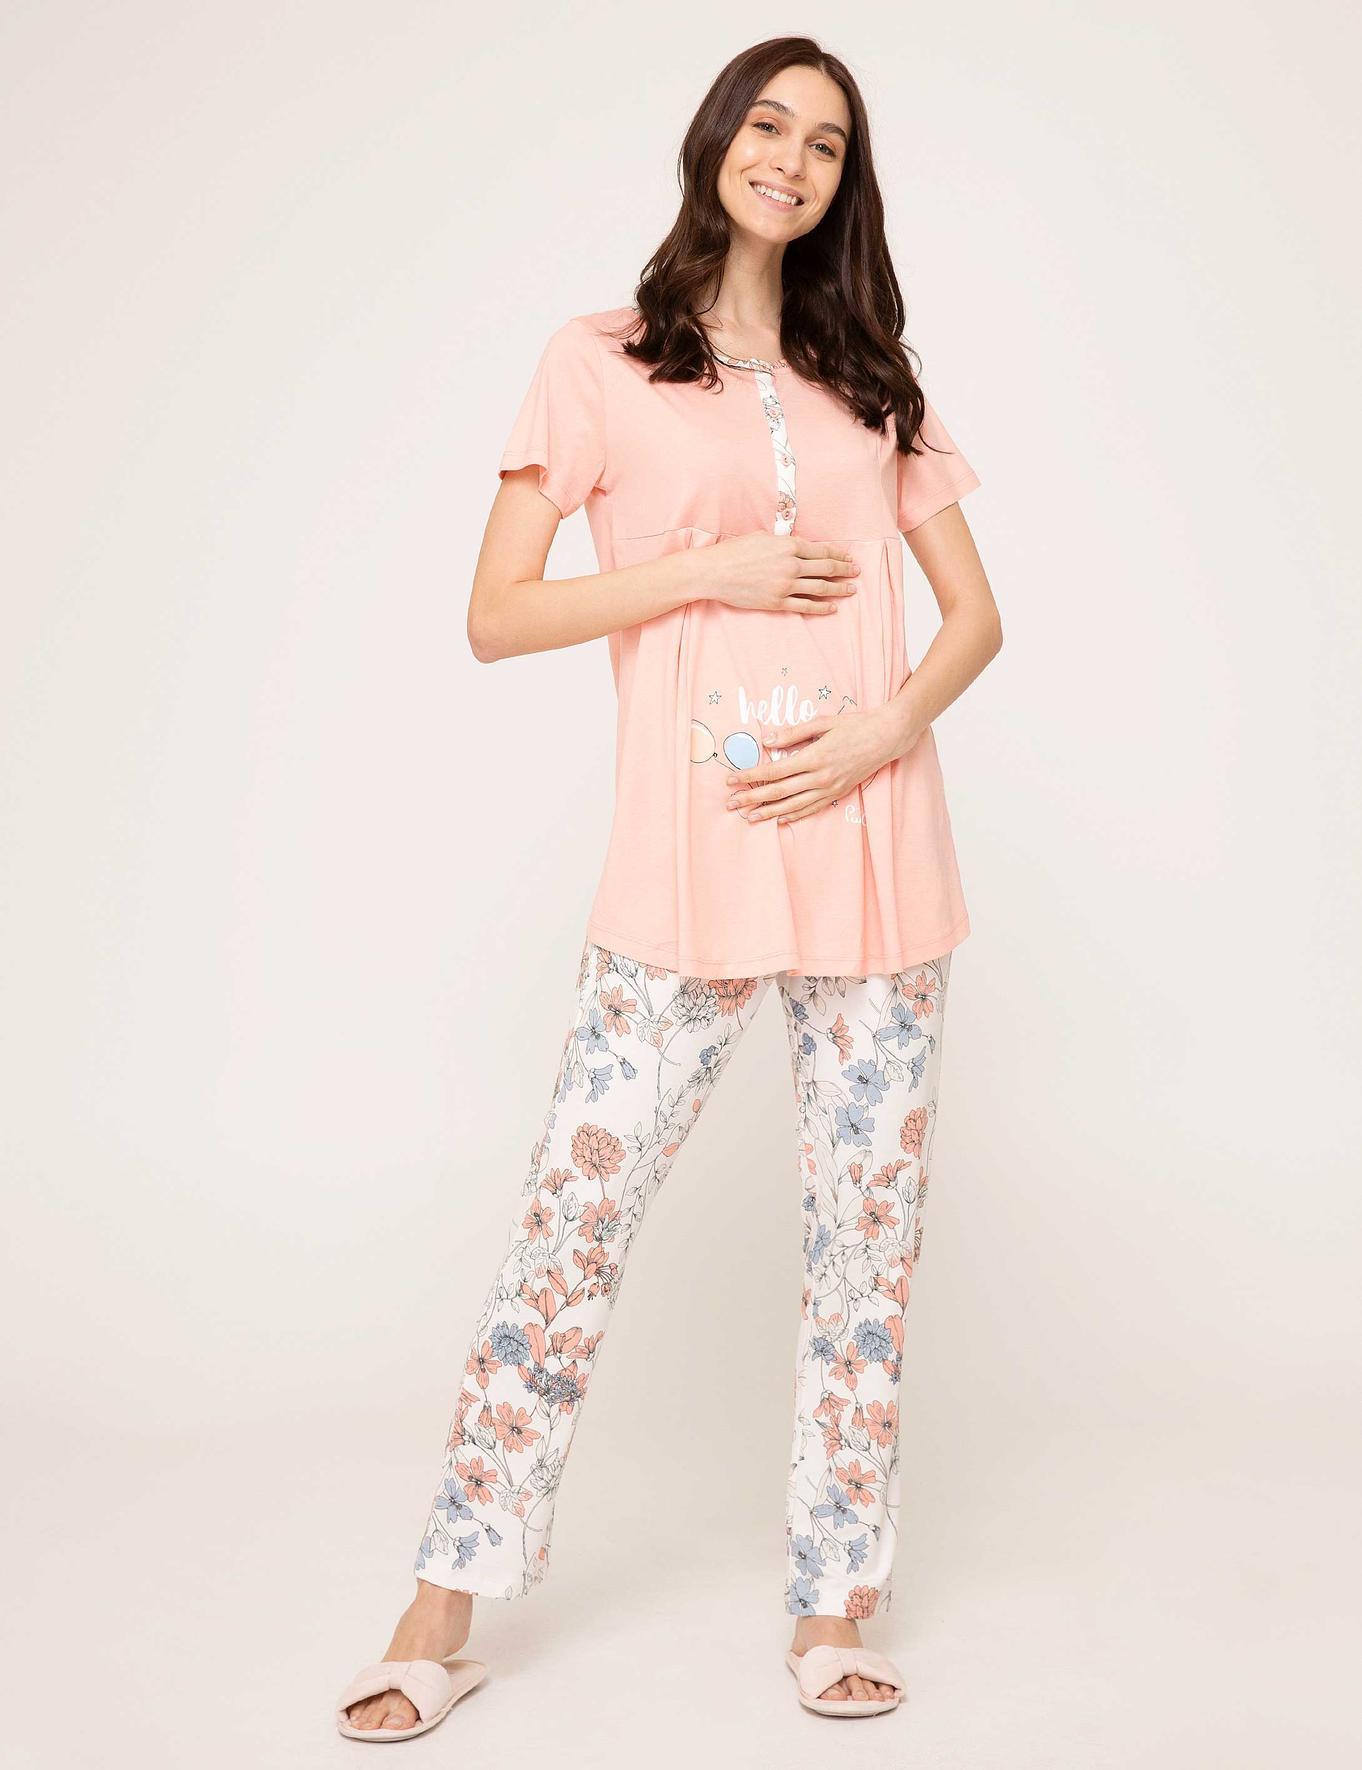 Turuncu Lohusa Pijama Takımı